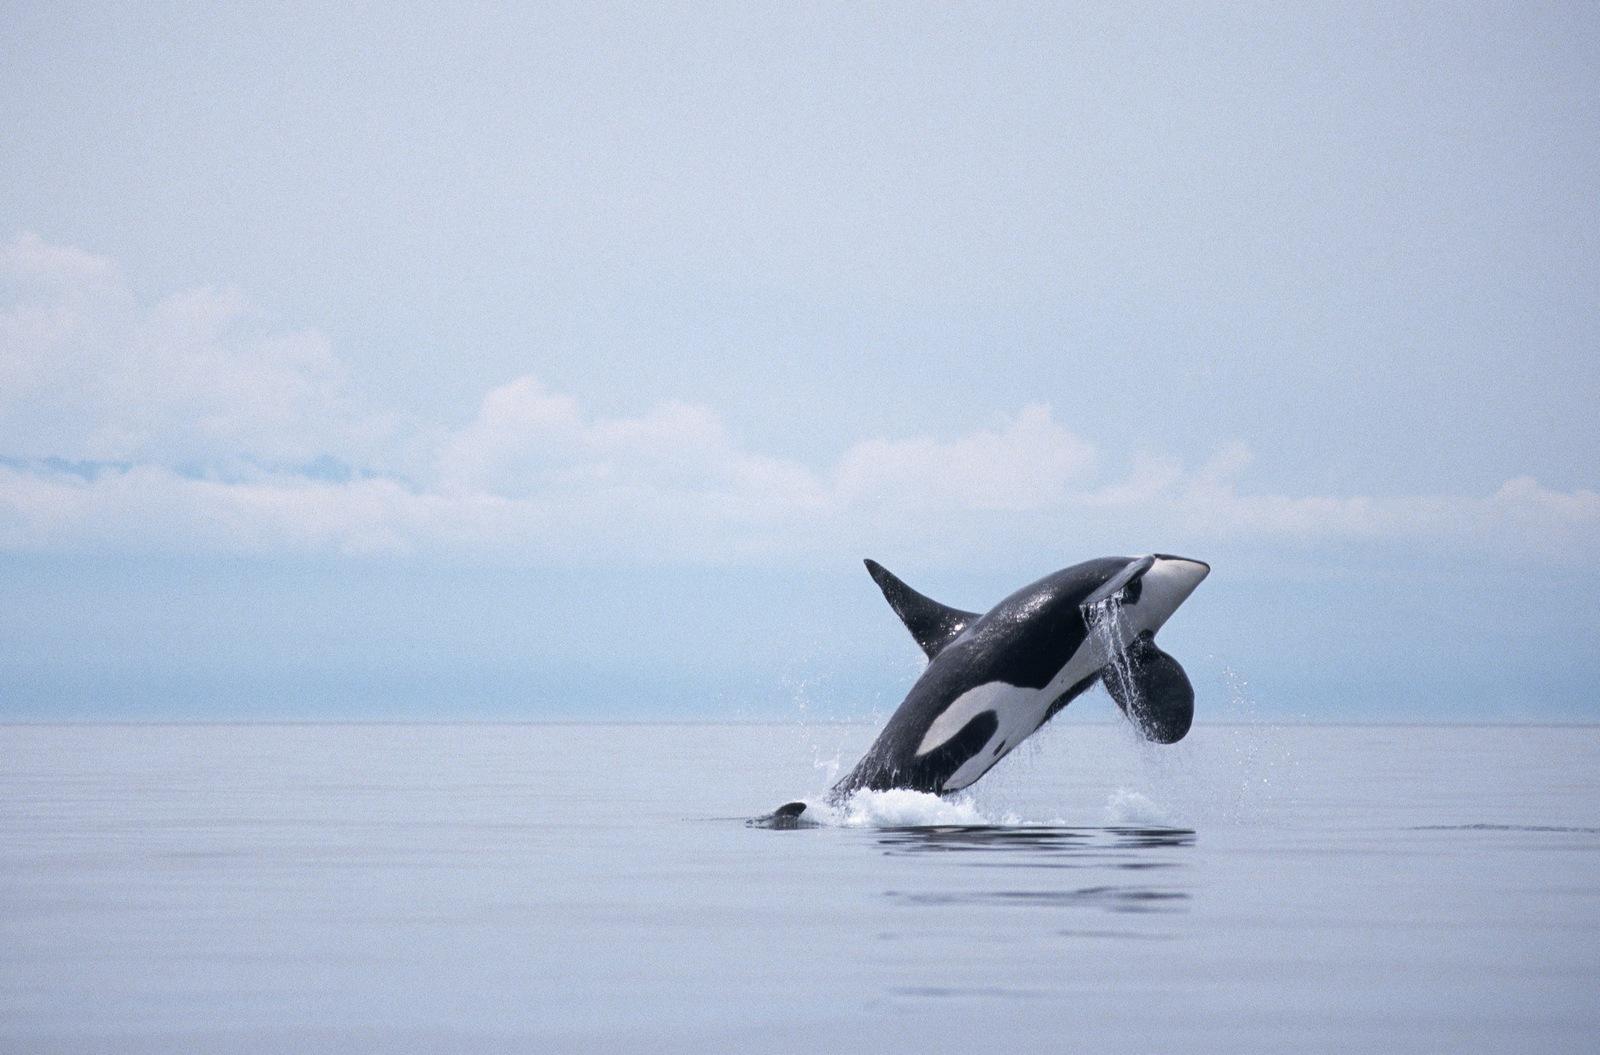 Killer Whale Fish Latest HD Wallpapers 2013 Beautiful 1600x1055